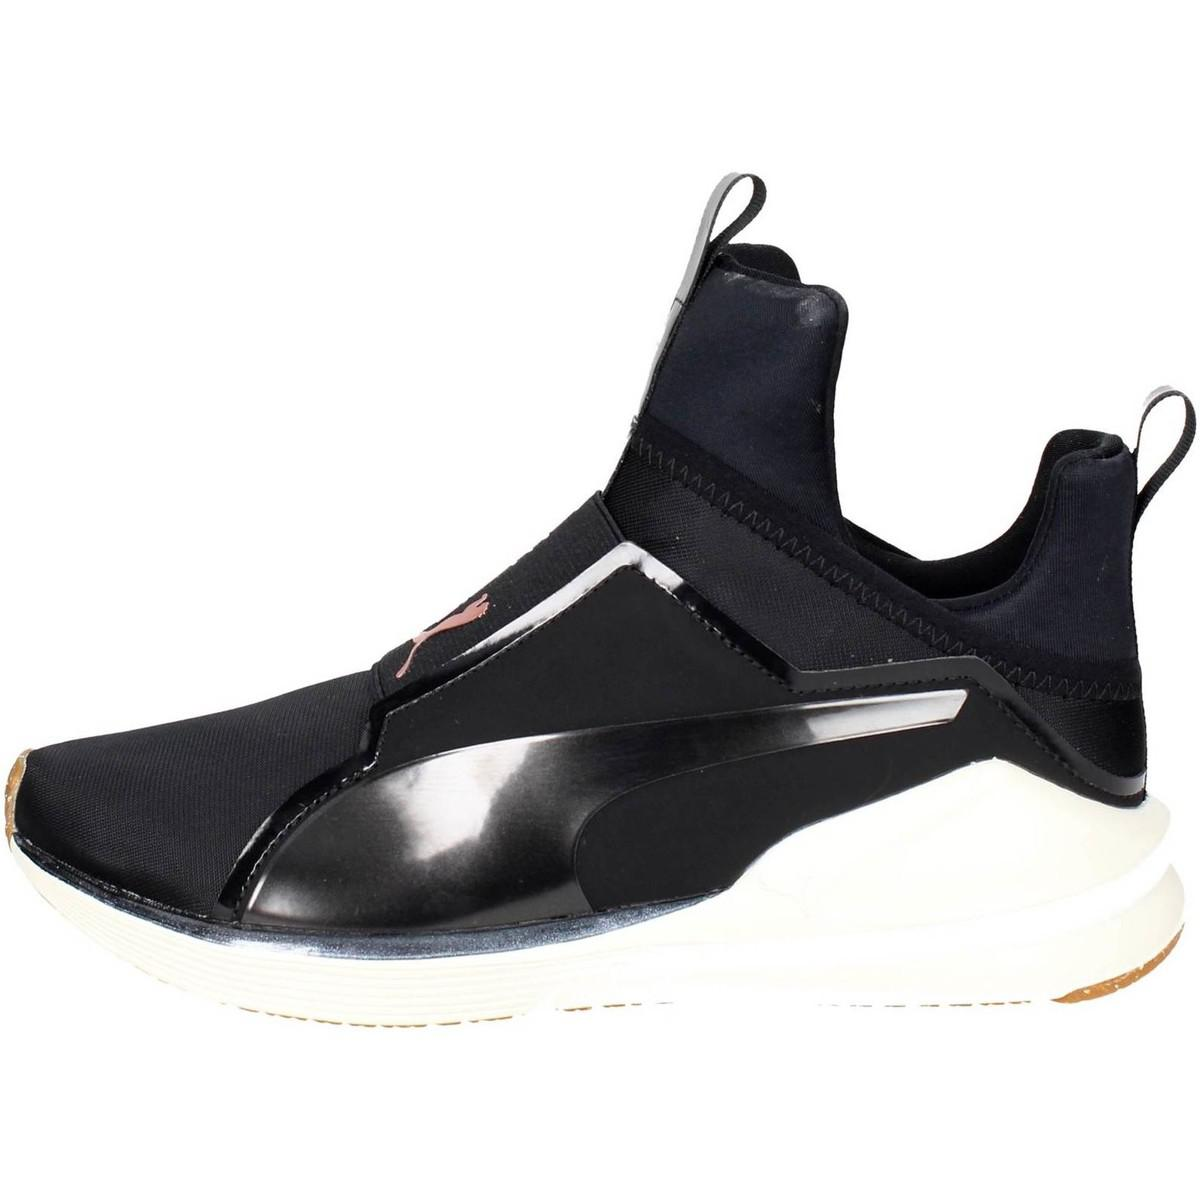 Puma 190347 01 Women s Shoes (high-top Trainers) In Black in Black ... 69049495e